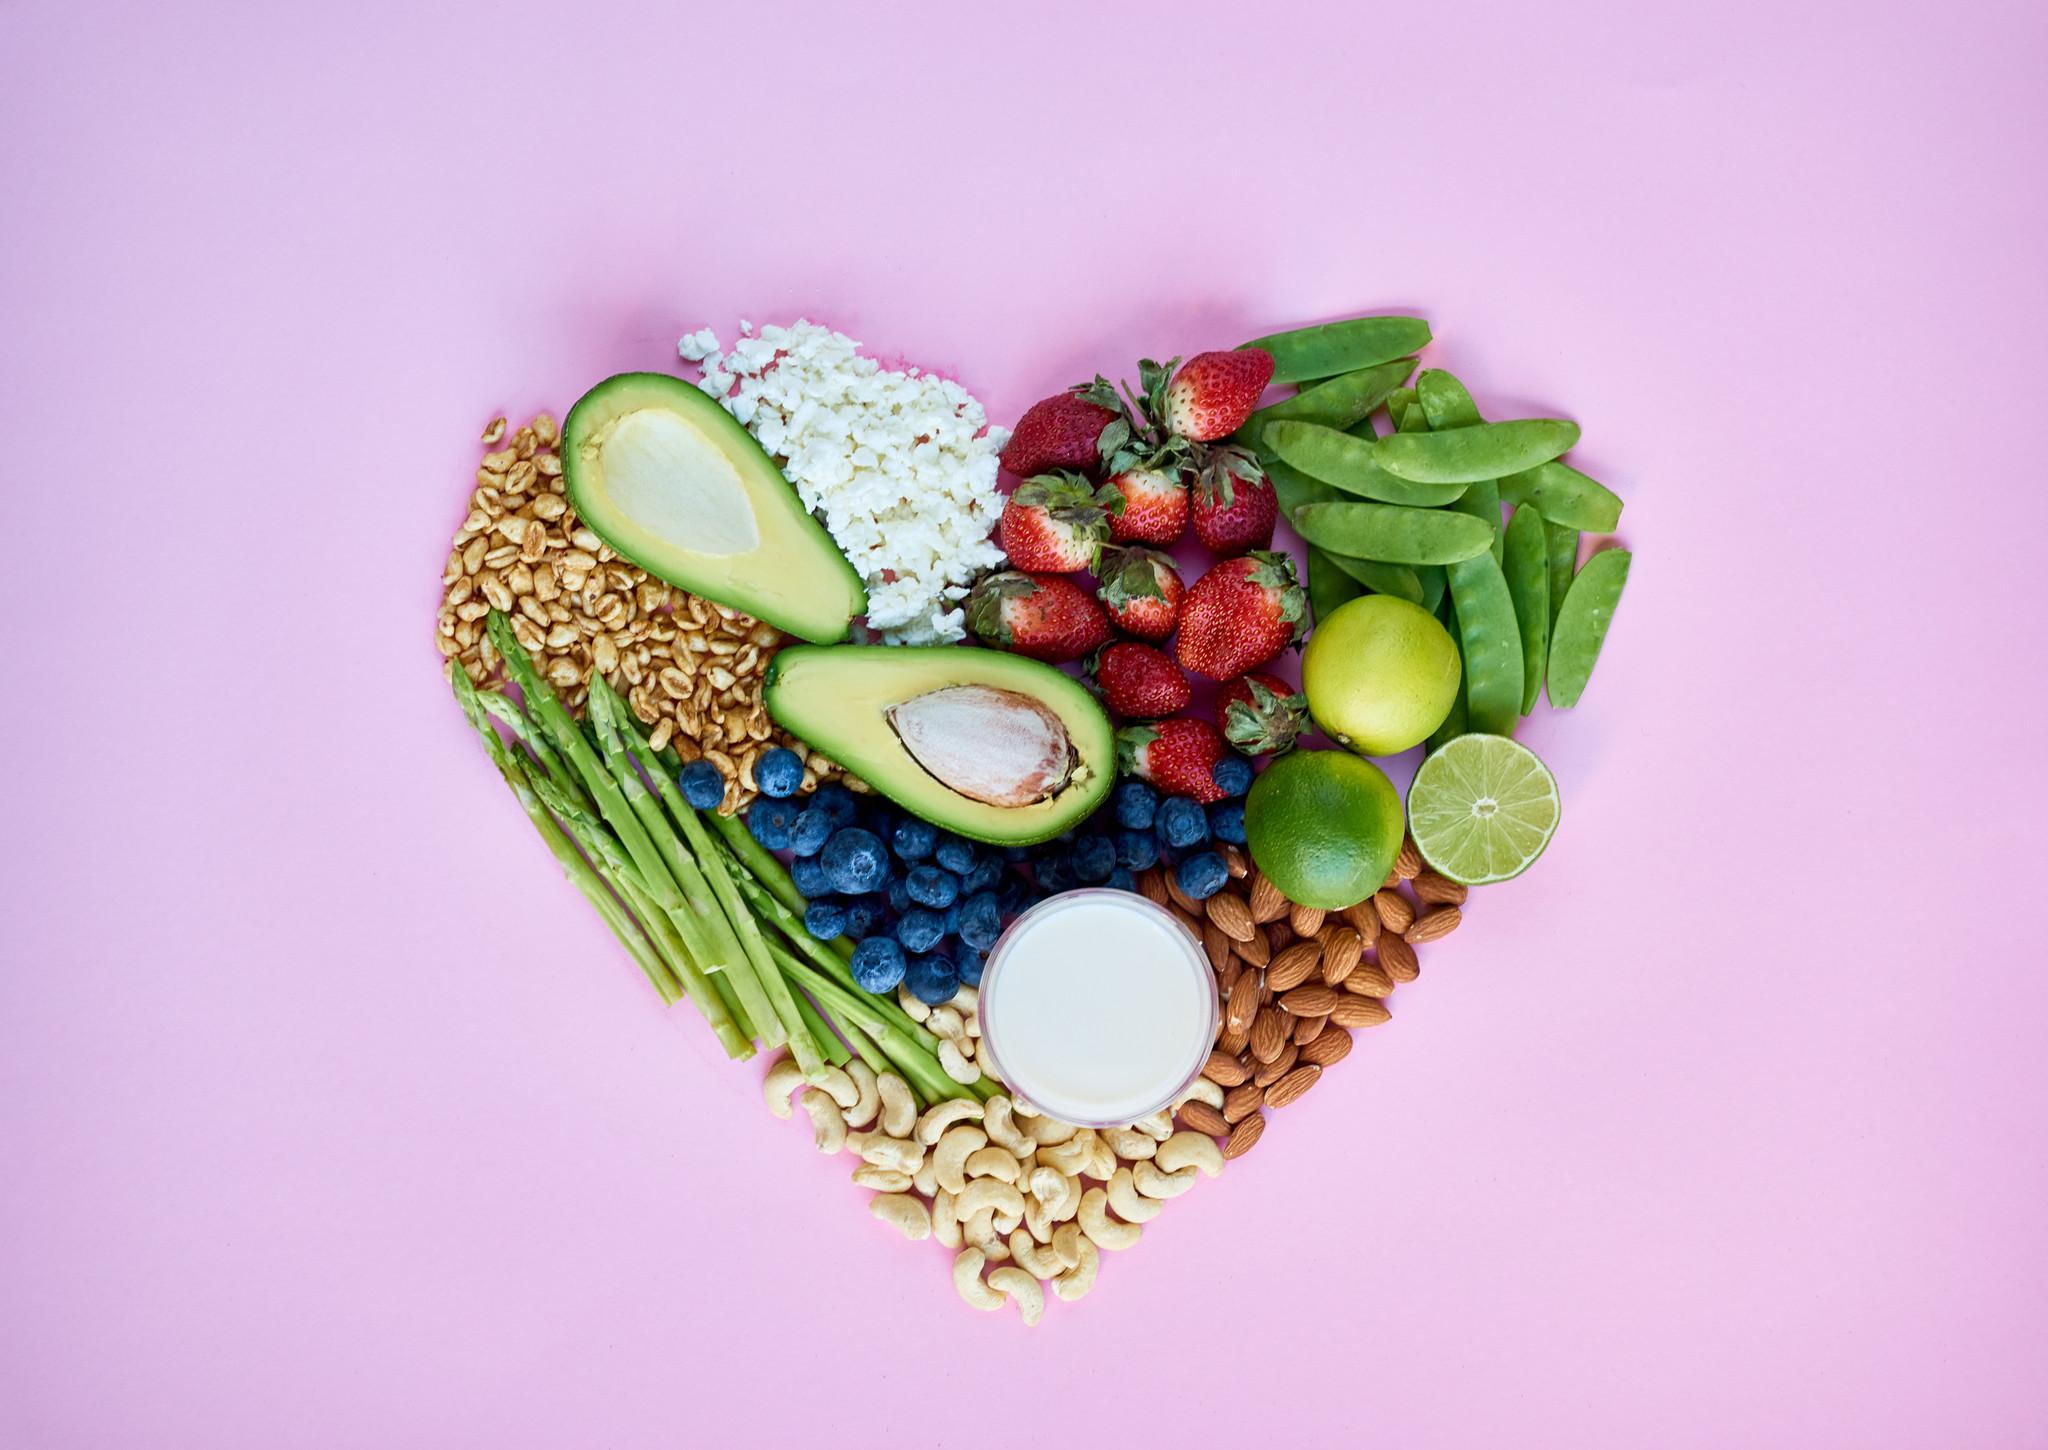 food comida fruta alimentos vegetais.jpg